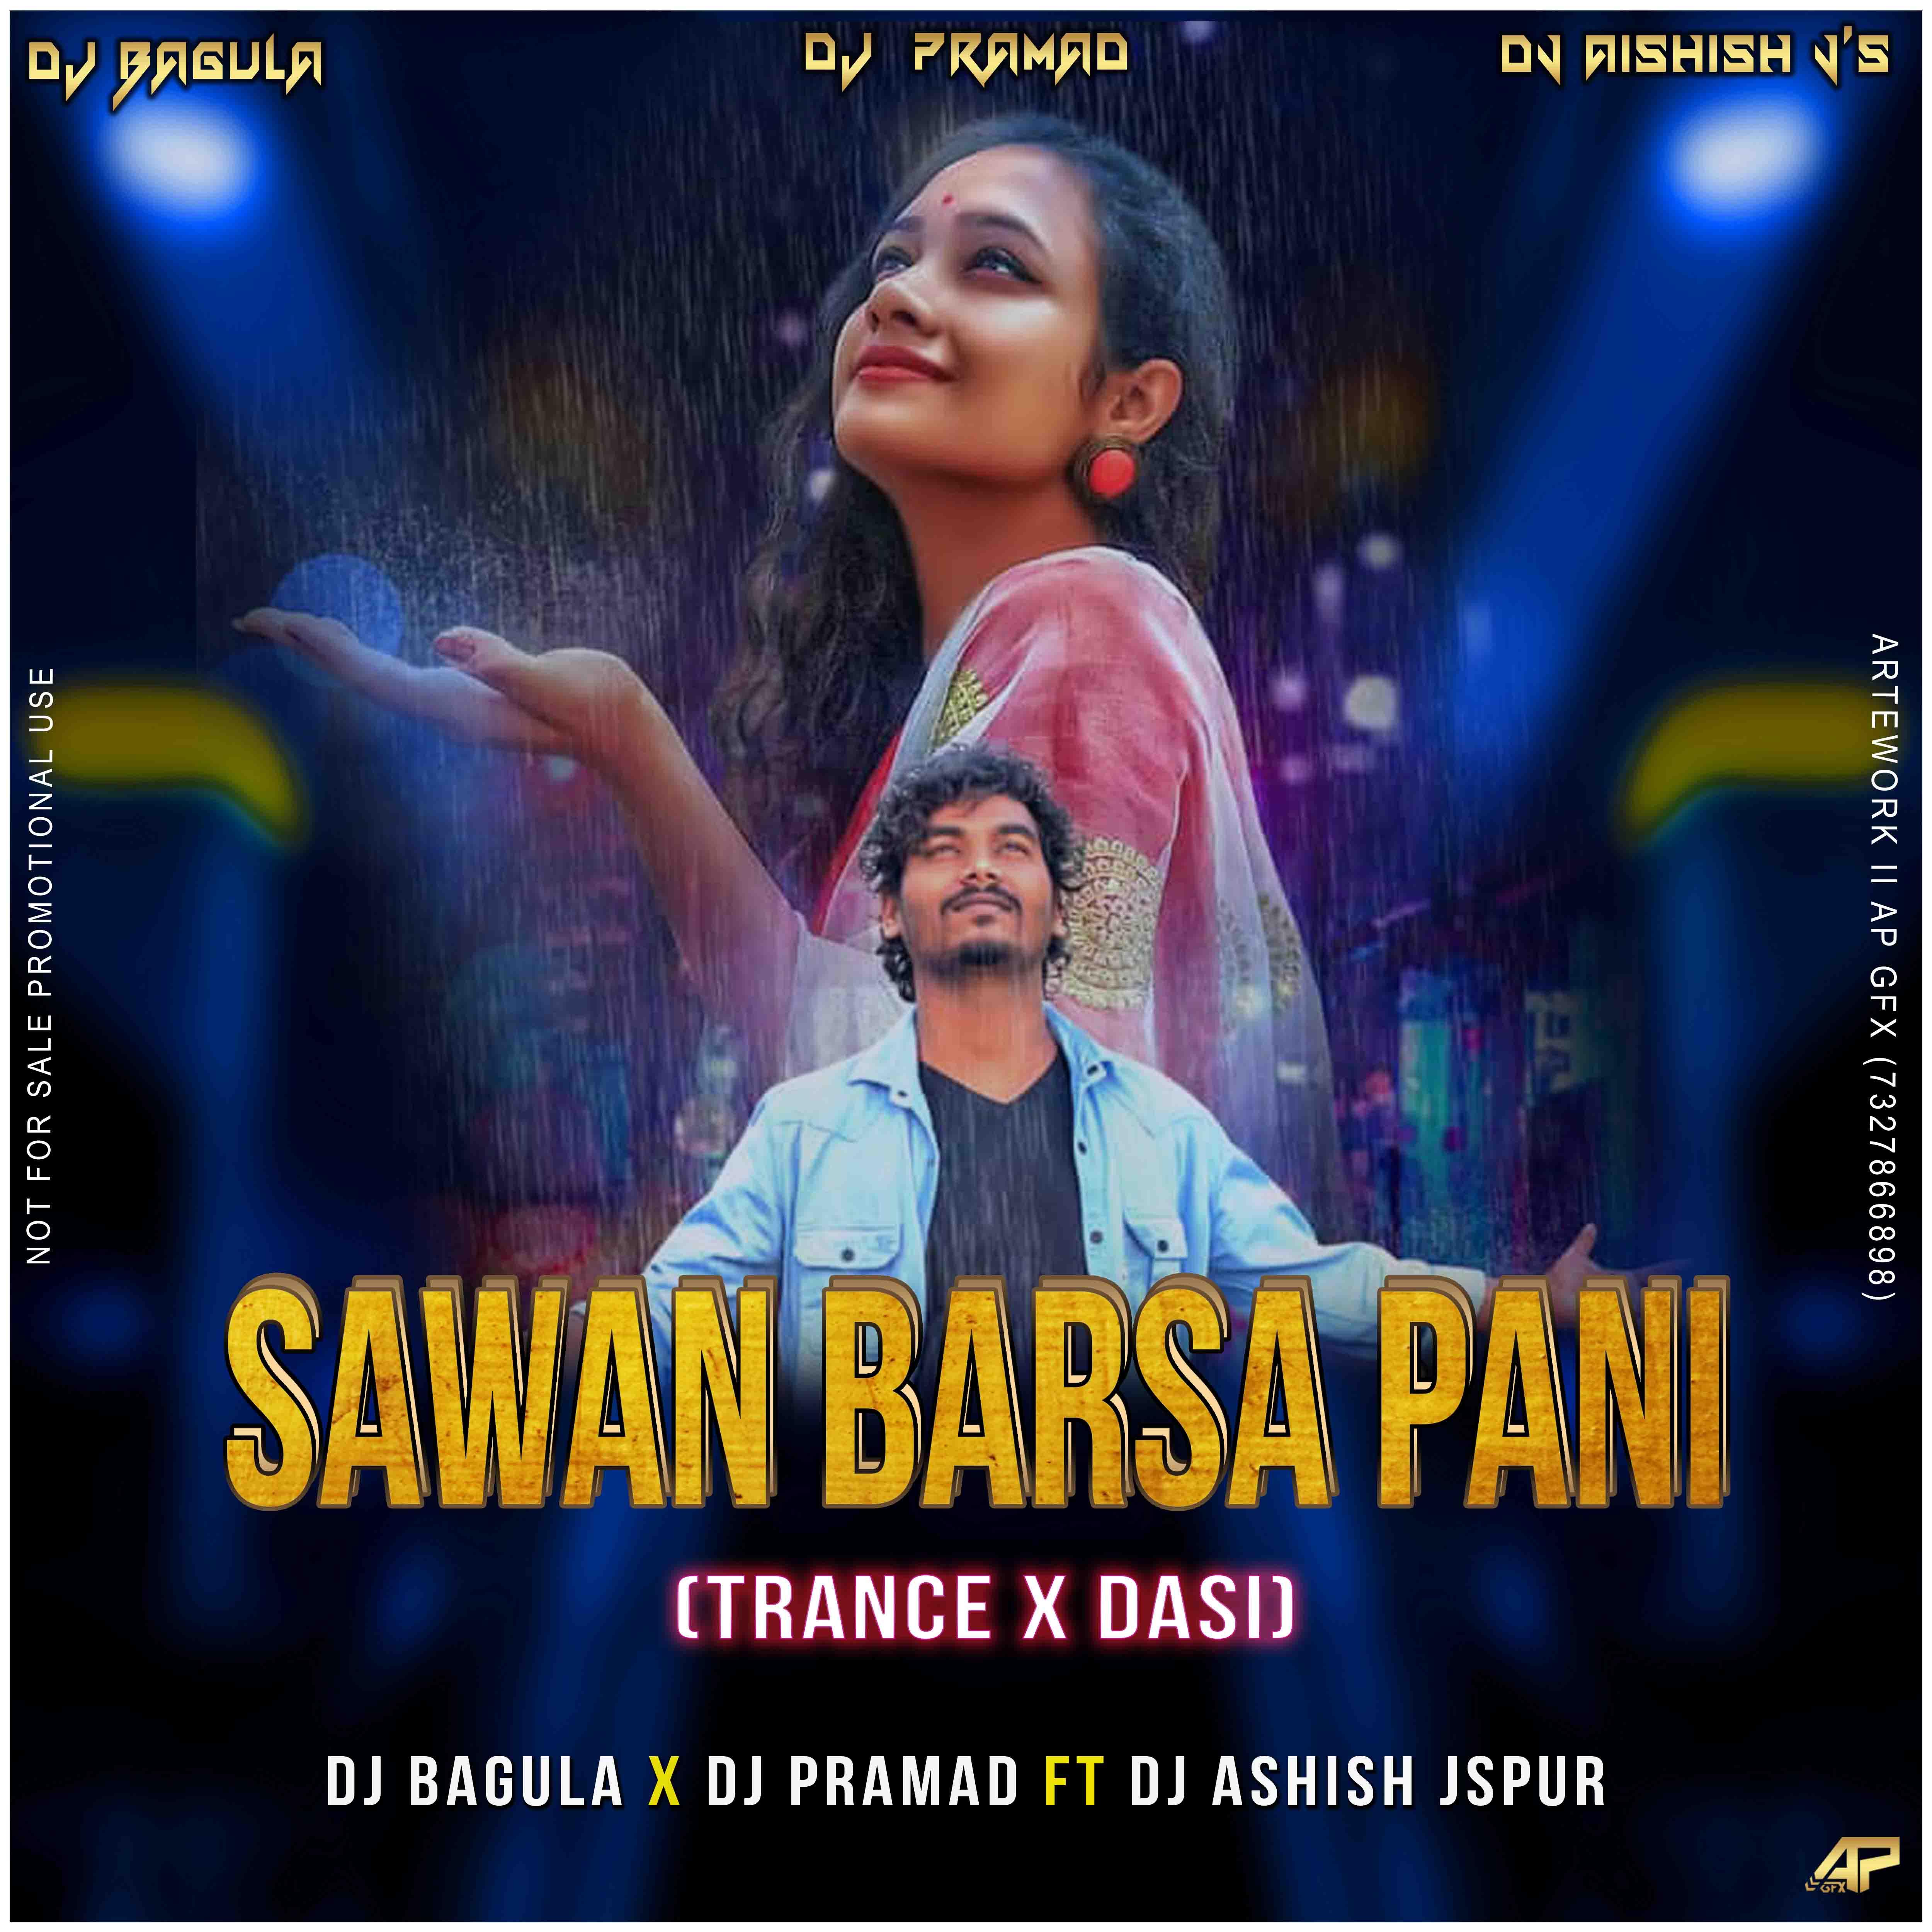 Sawan Barsa Pani (Trance VS Desi) Dj Bagula x Dj Promad X Dj Ashish Js Puru